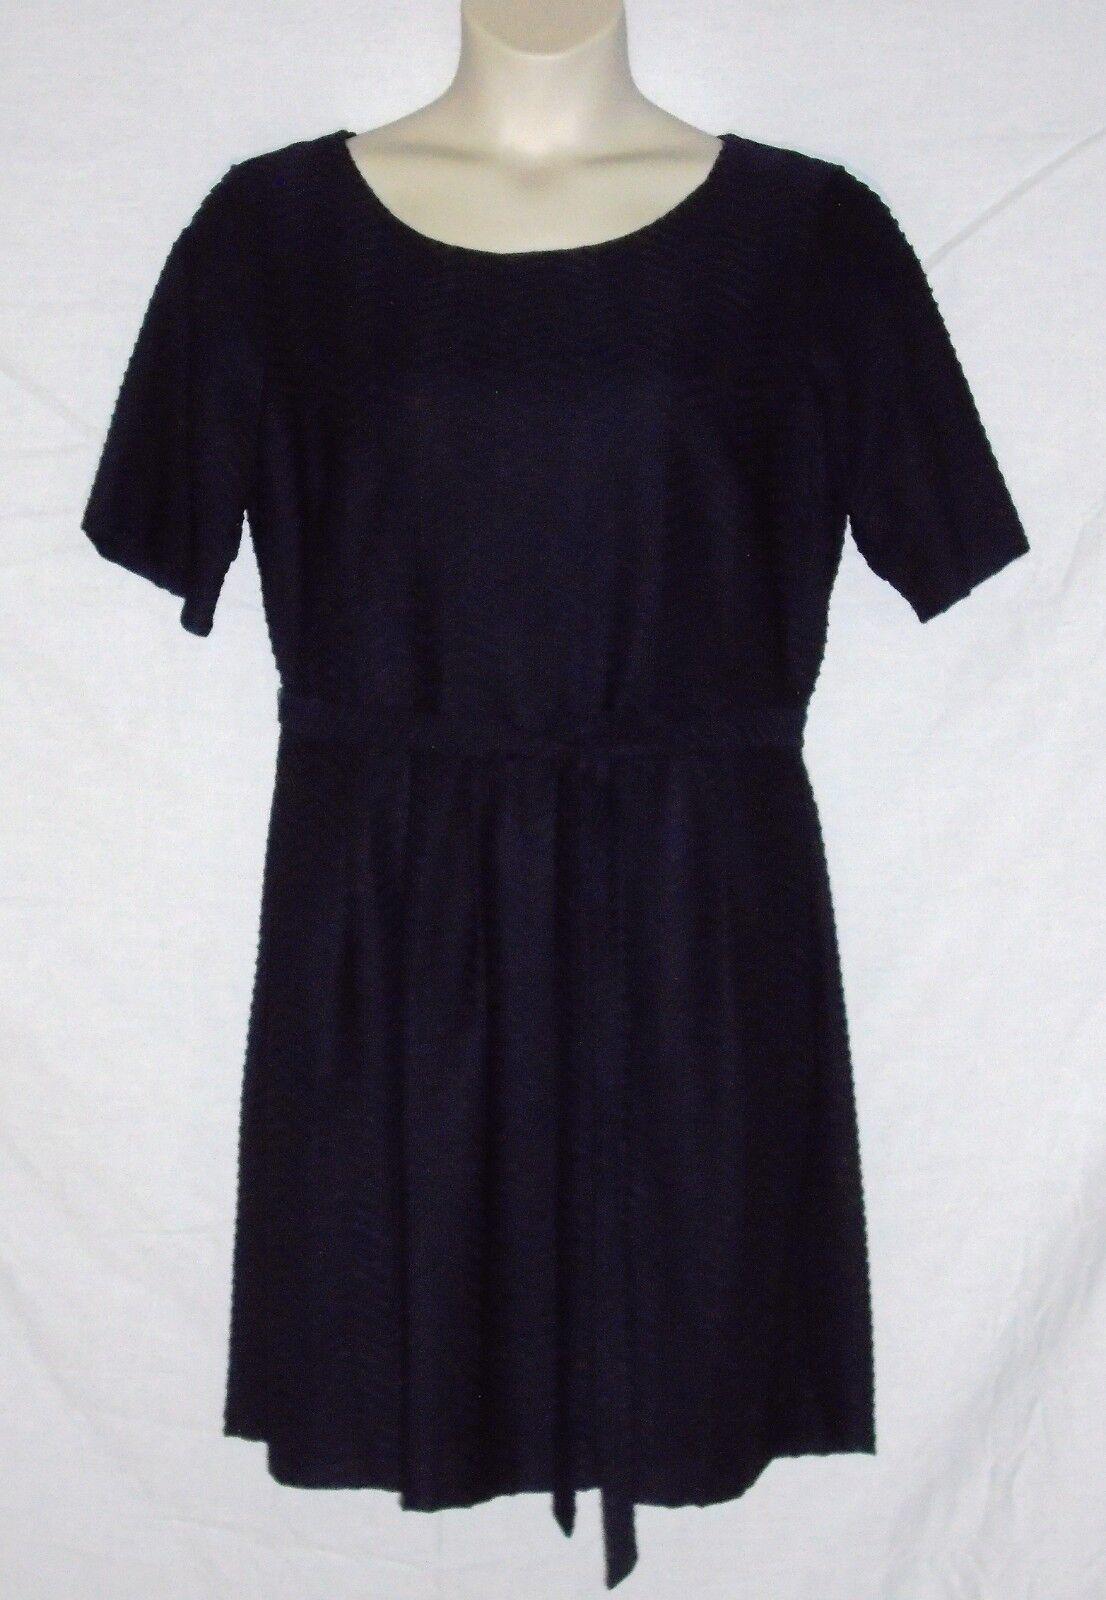 ENFOCUS WOMEN – DRESS - RIBBED FABRIC & TIE BELT – NAVY blueE – 18W – NEW  54